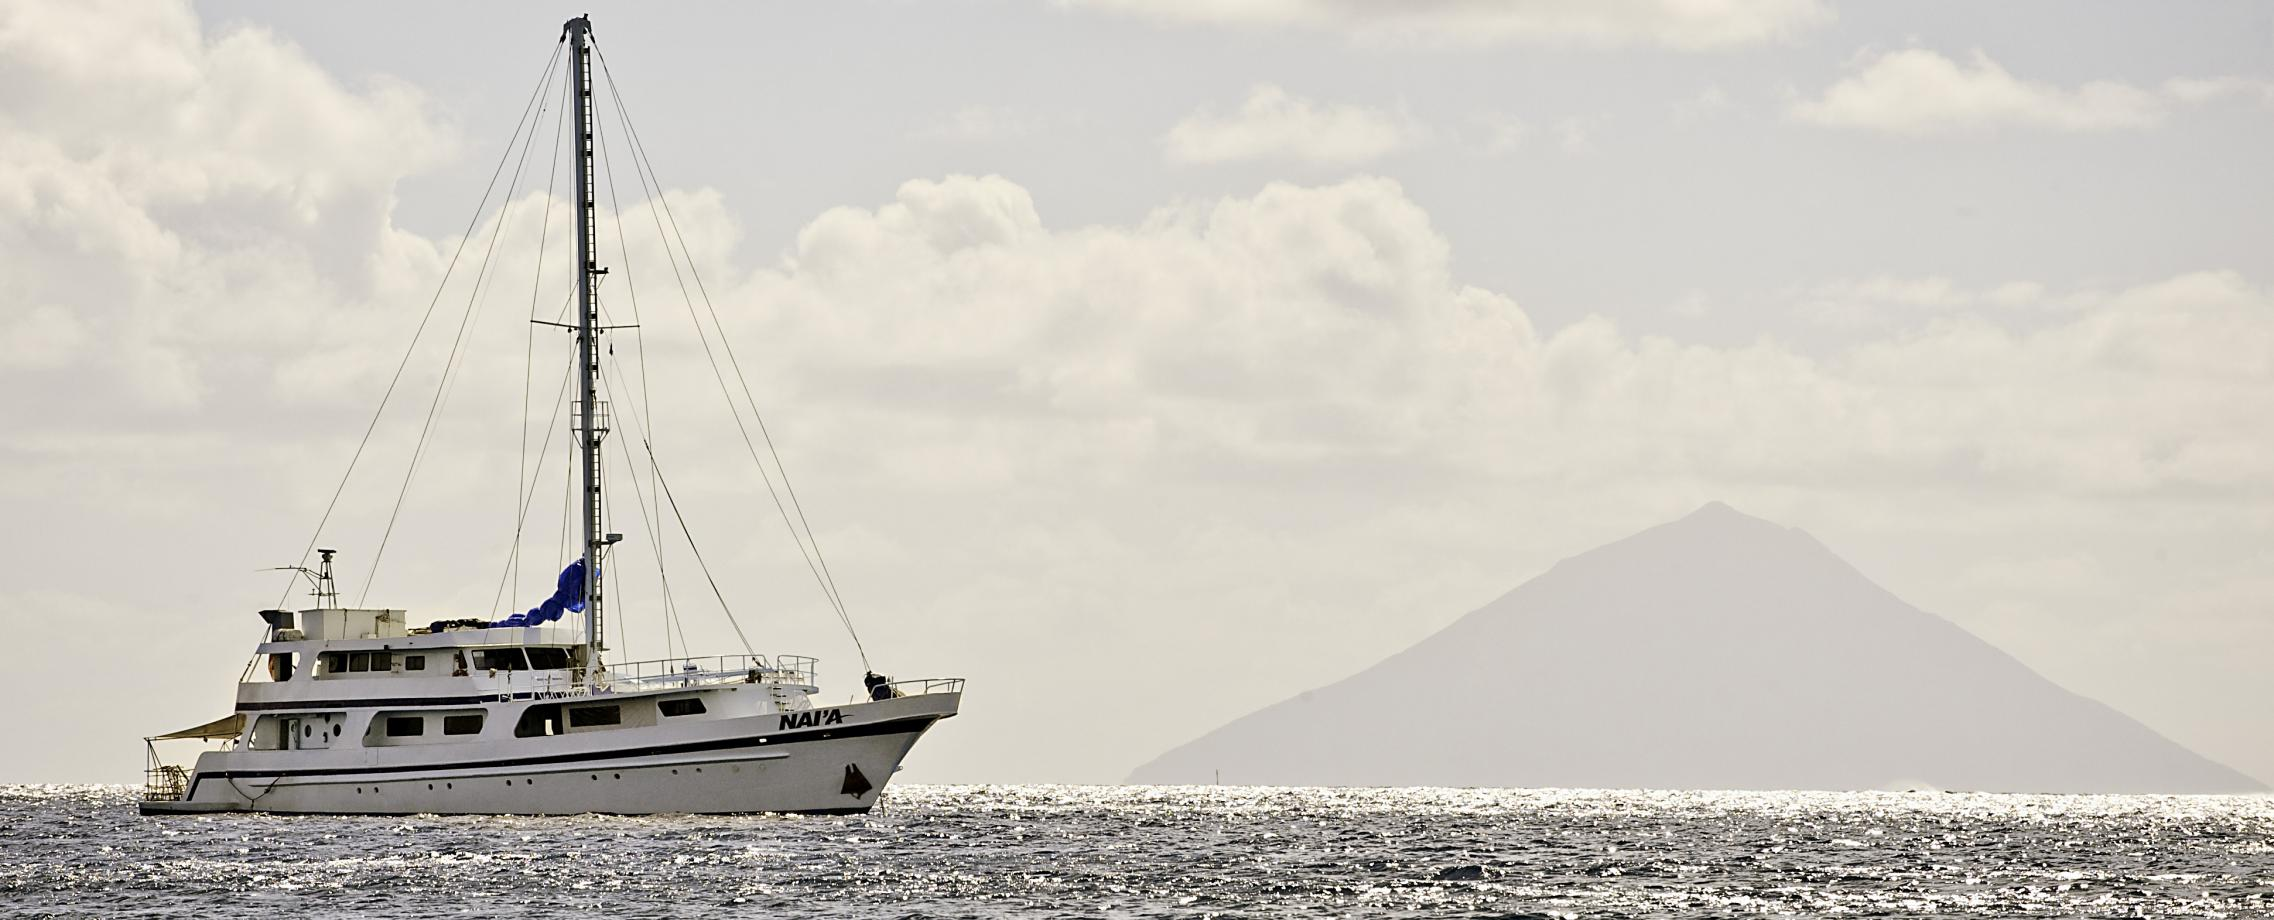 Nai'a, Fiji | Amazing Adventures Travel